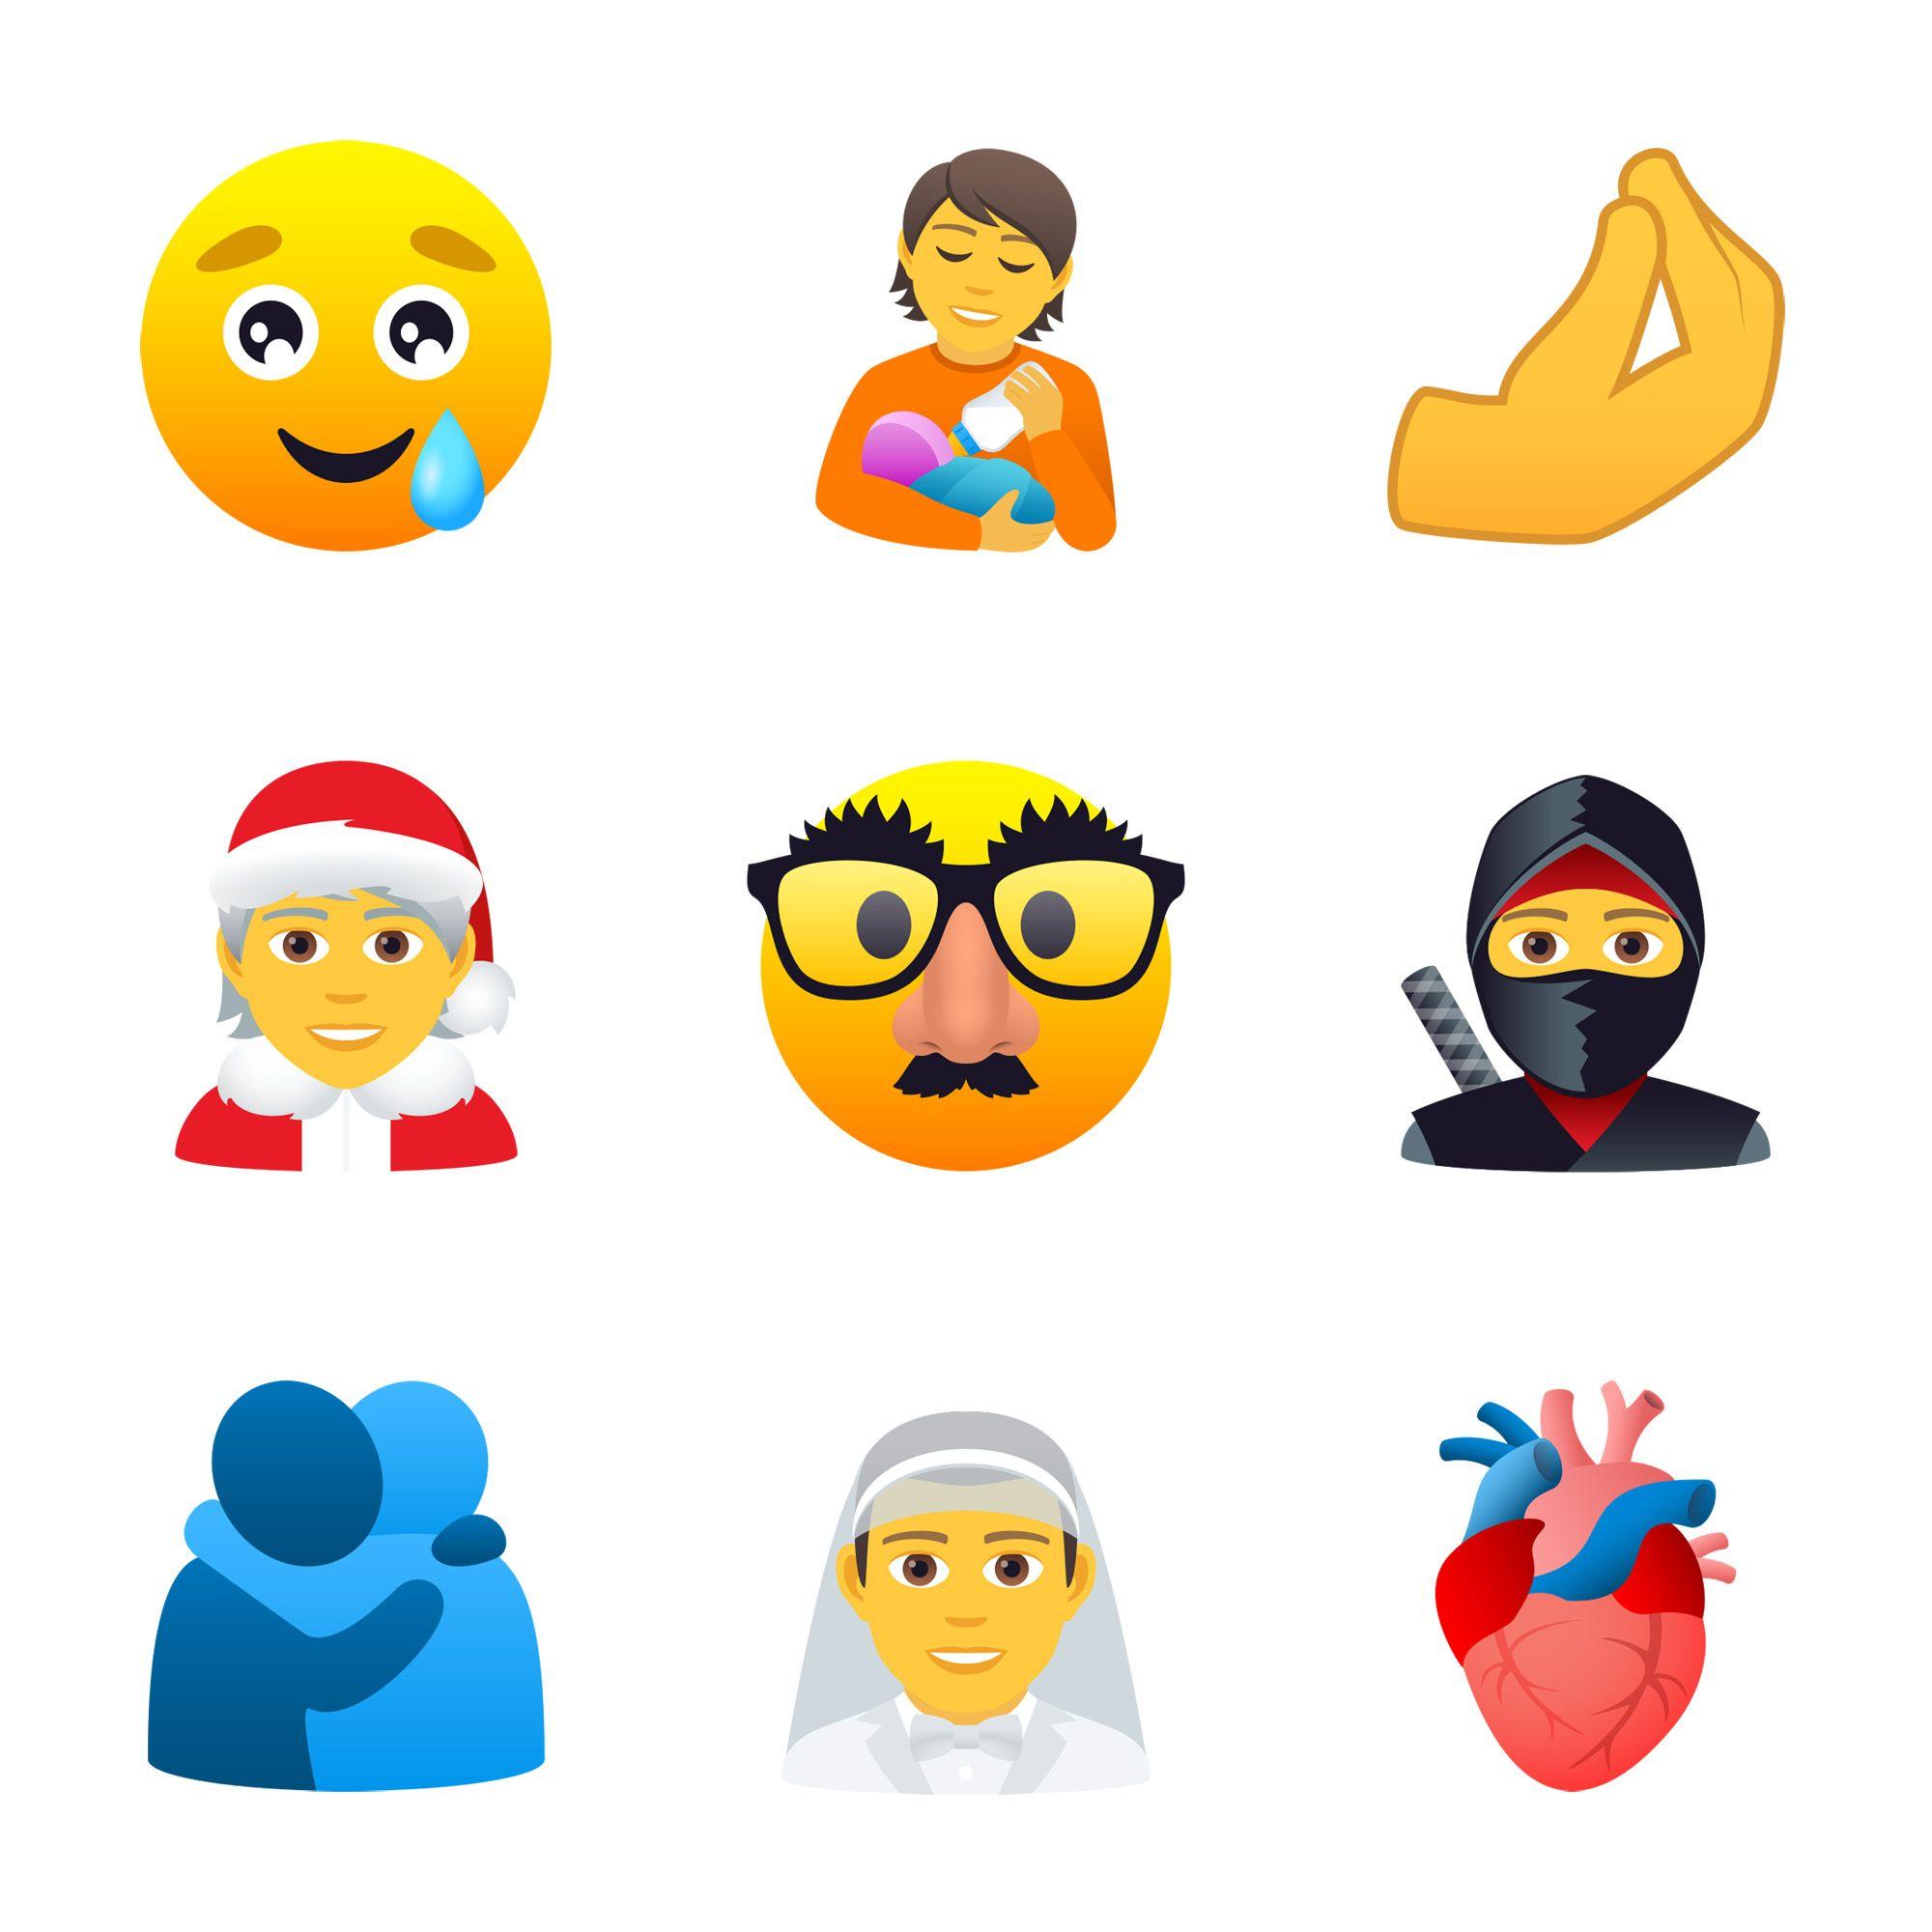 Emojipedia-JoyPixels-6-New-Smiley-and-People-Selection